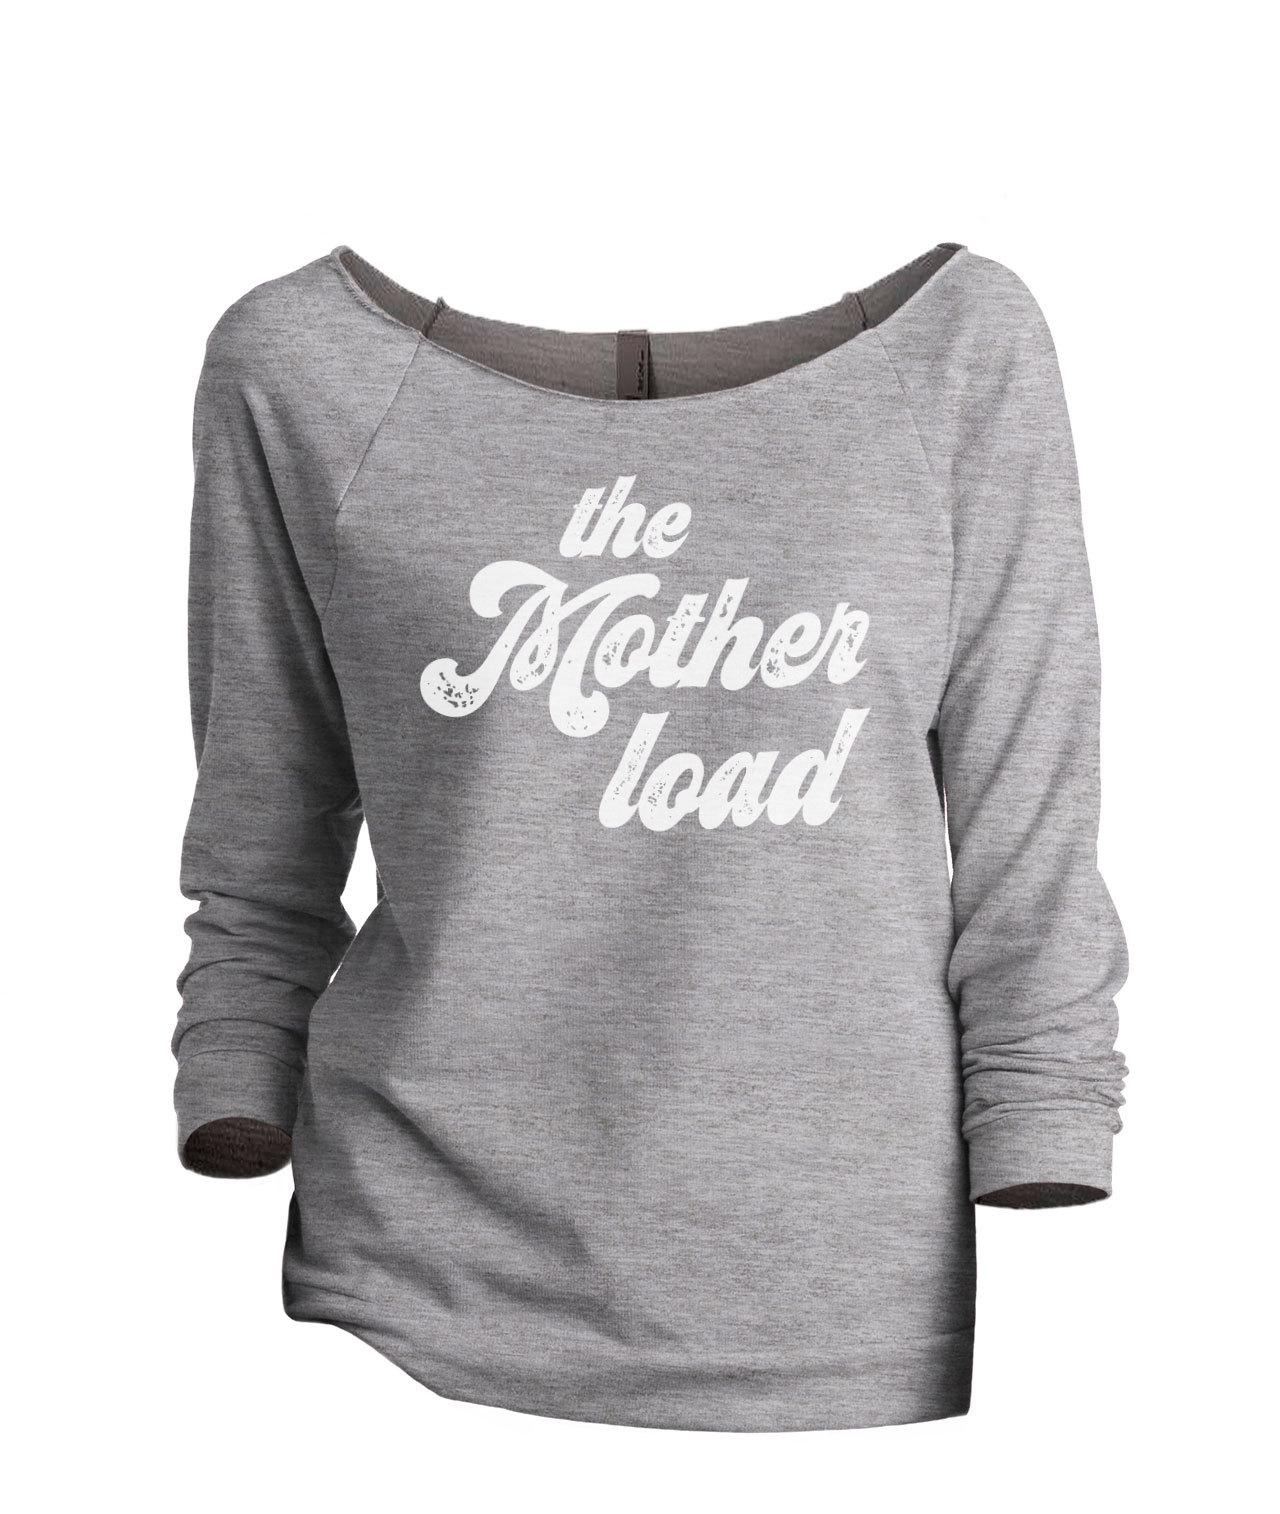 Thread Tank The Mother Load Women's Slouchy 3/4 Sleeves Raglan Sweatshirt Sport  - $24.99 - $25.99